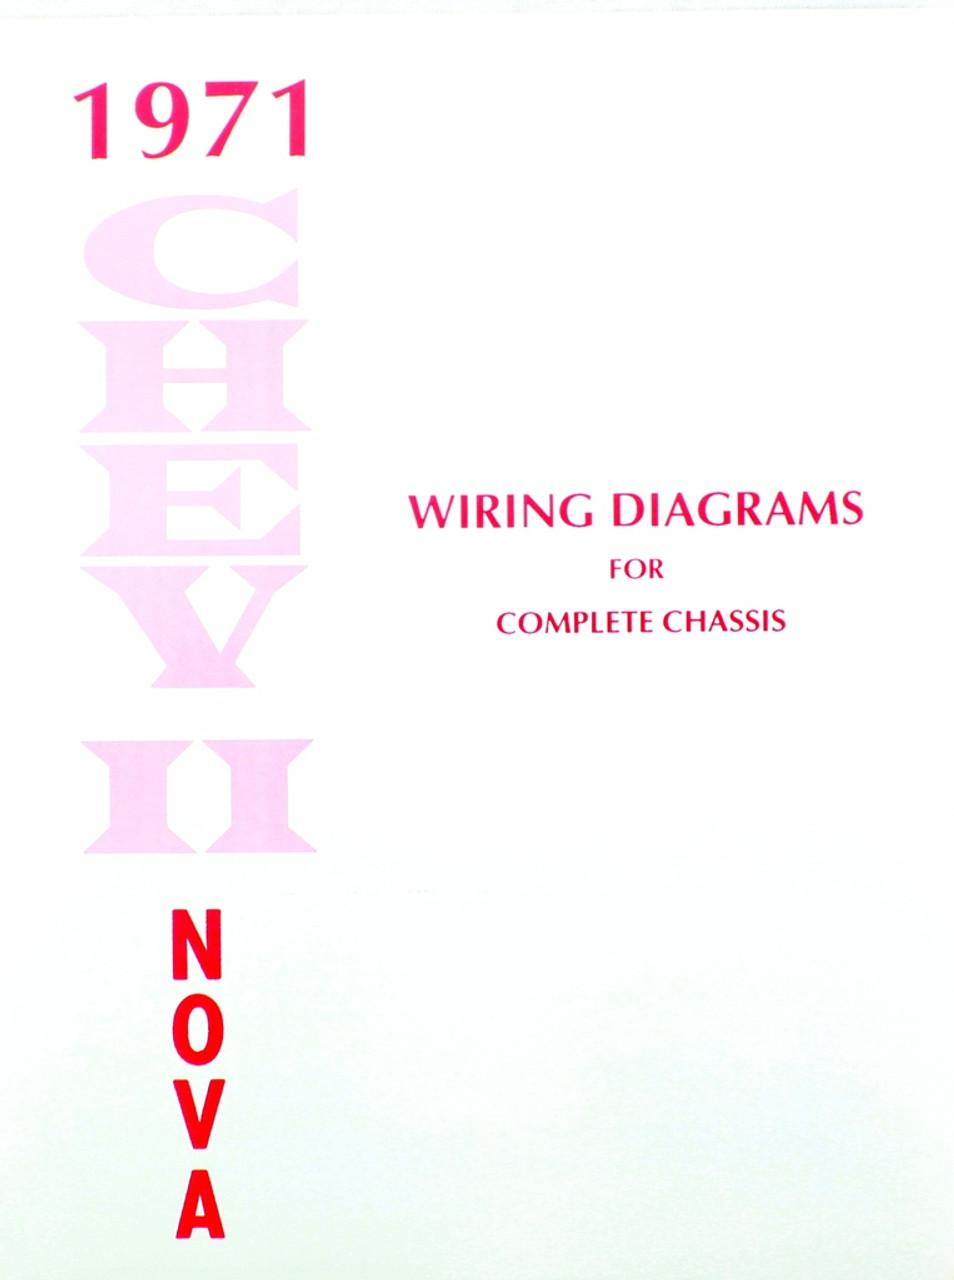 Diagram 1978 Chevy Nova Wiring Diagram Fuse Box Wiring Diagram Chevy